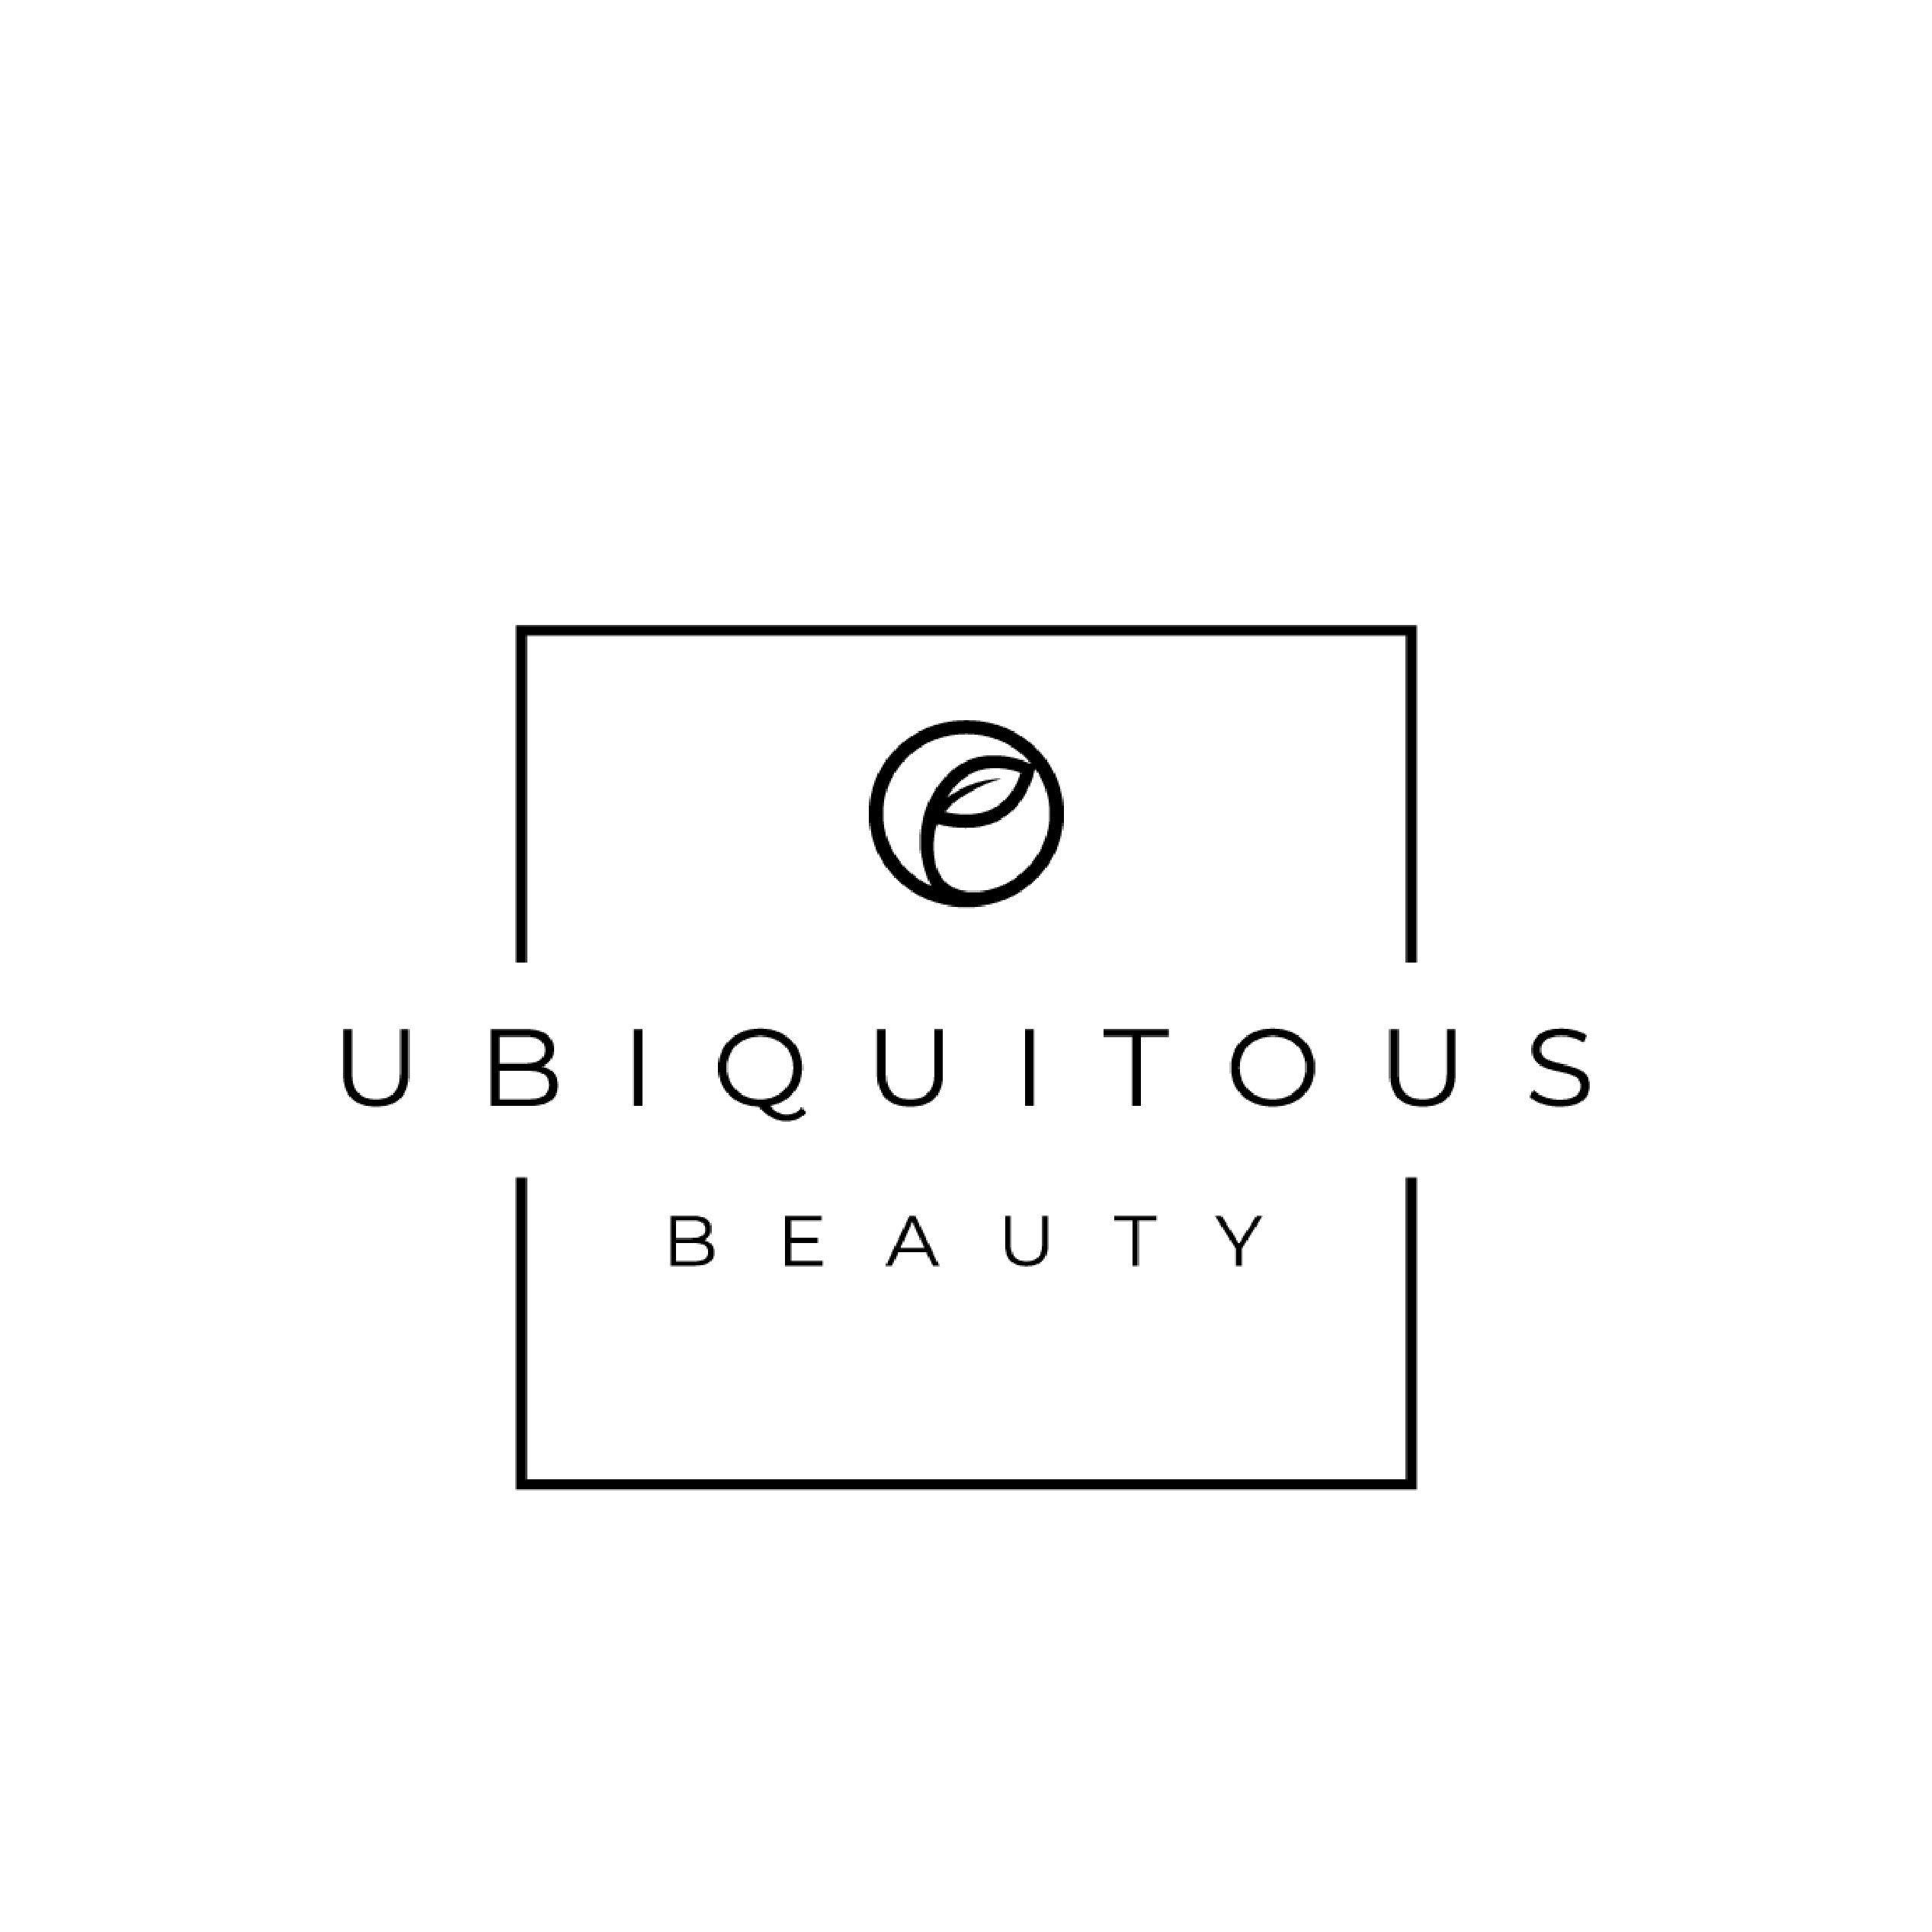 Ubiquitous Beauty Cosmetics Coupons & Promo codes